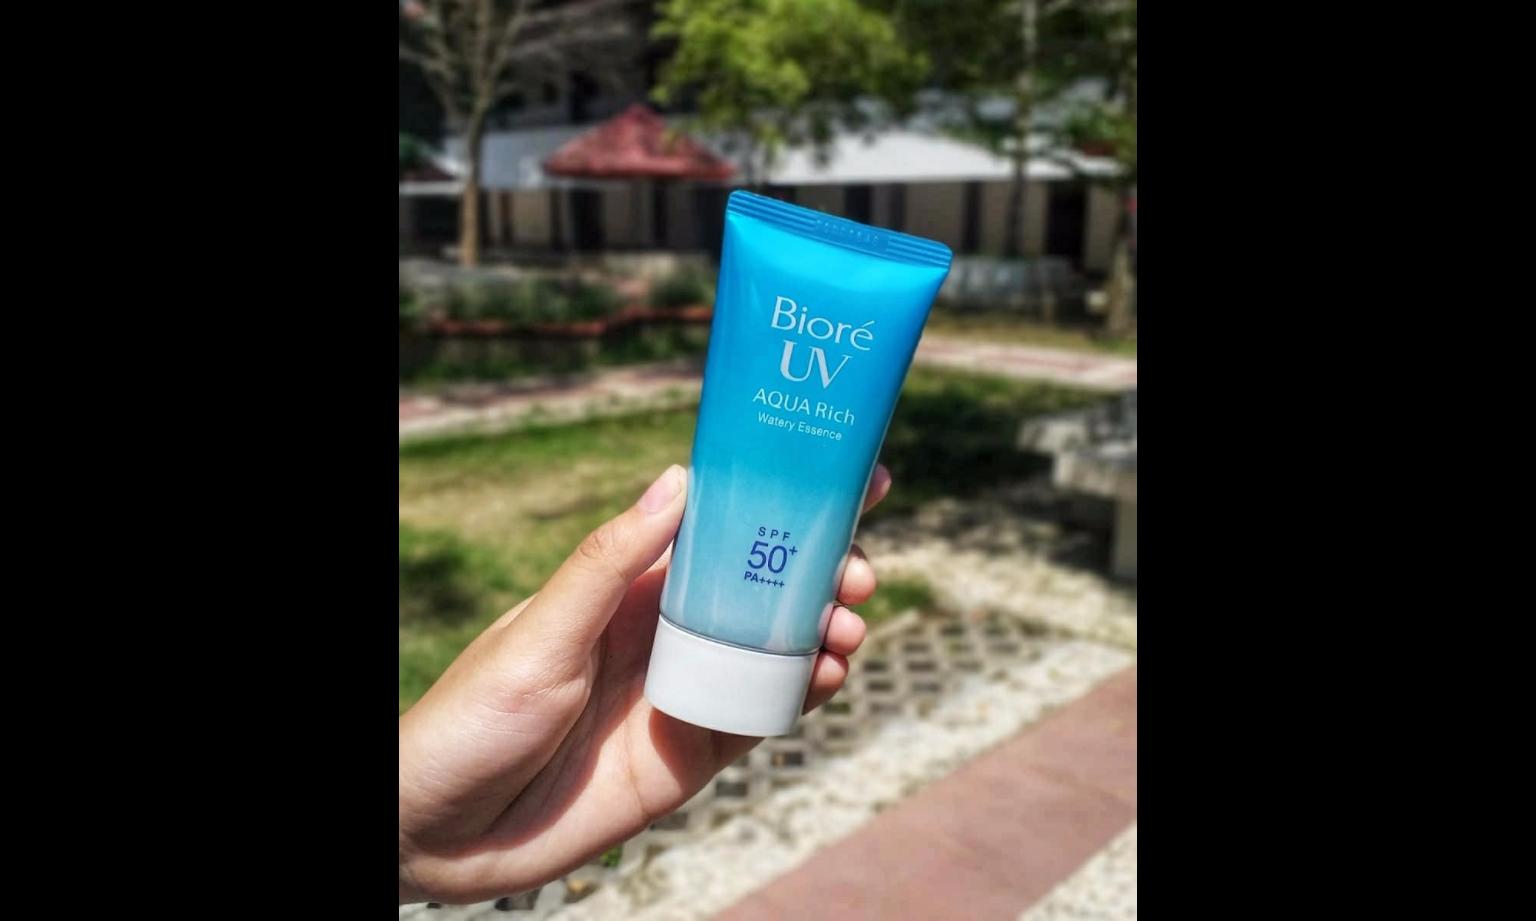 Biore UV Aqua Rich Watery Essence SPF 50